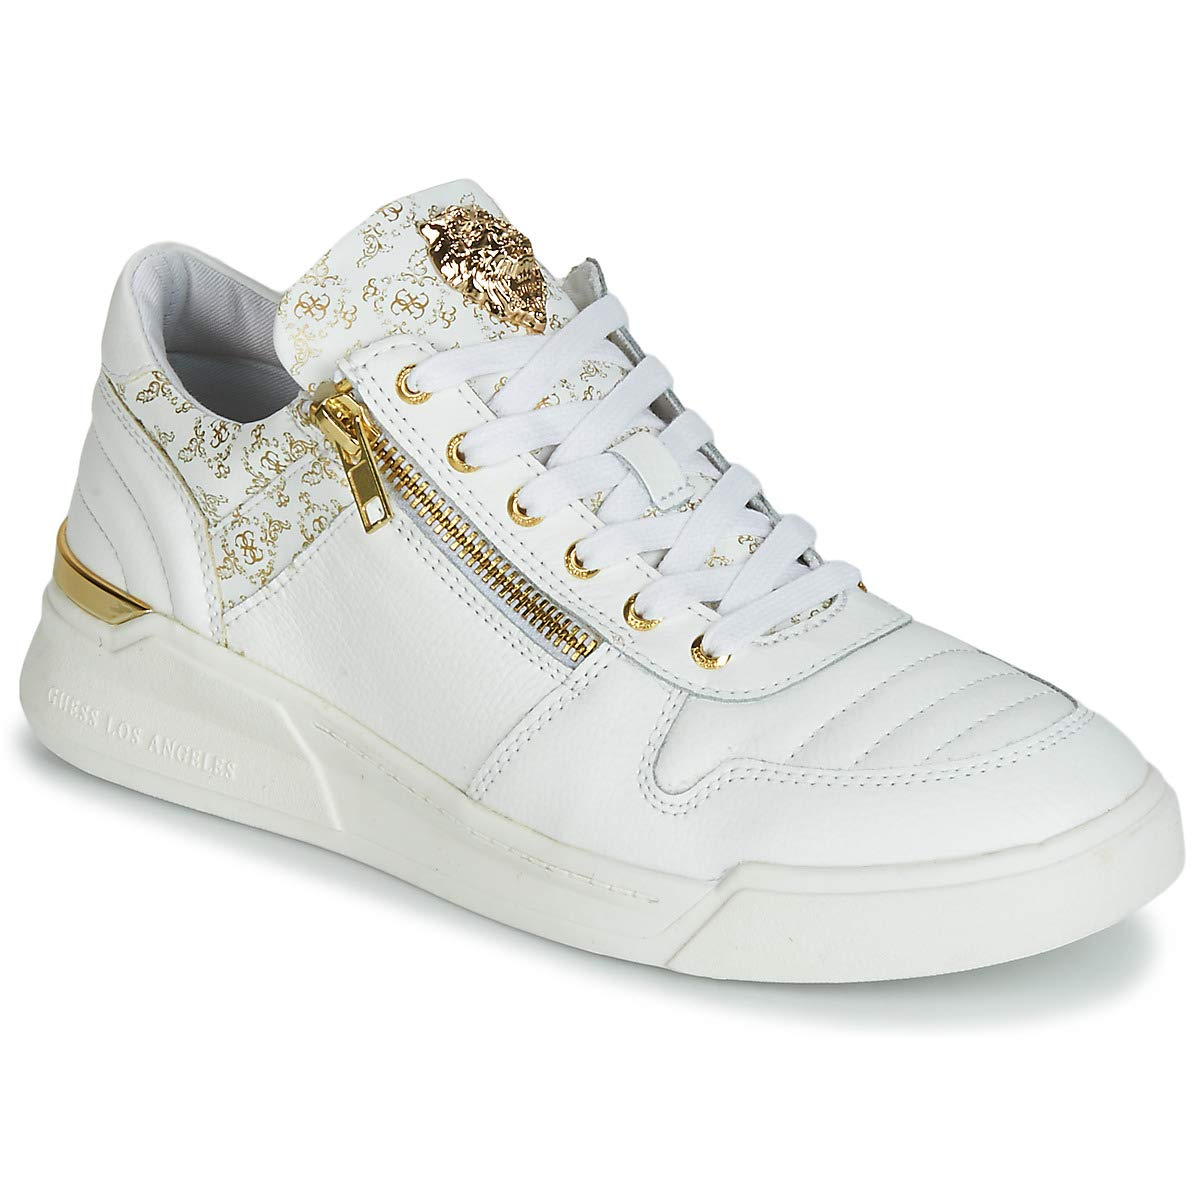 Low Sneaker Weiss LowSchuhe Herren Knight Guess wmN0v8n